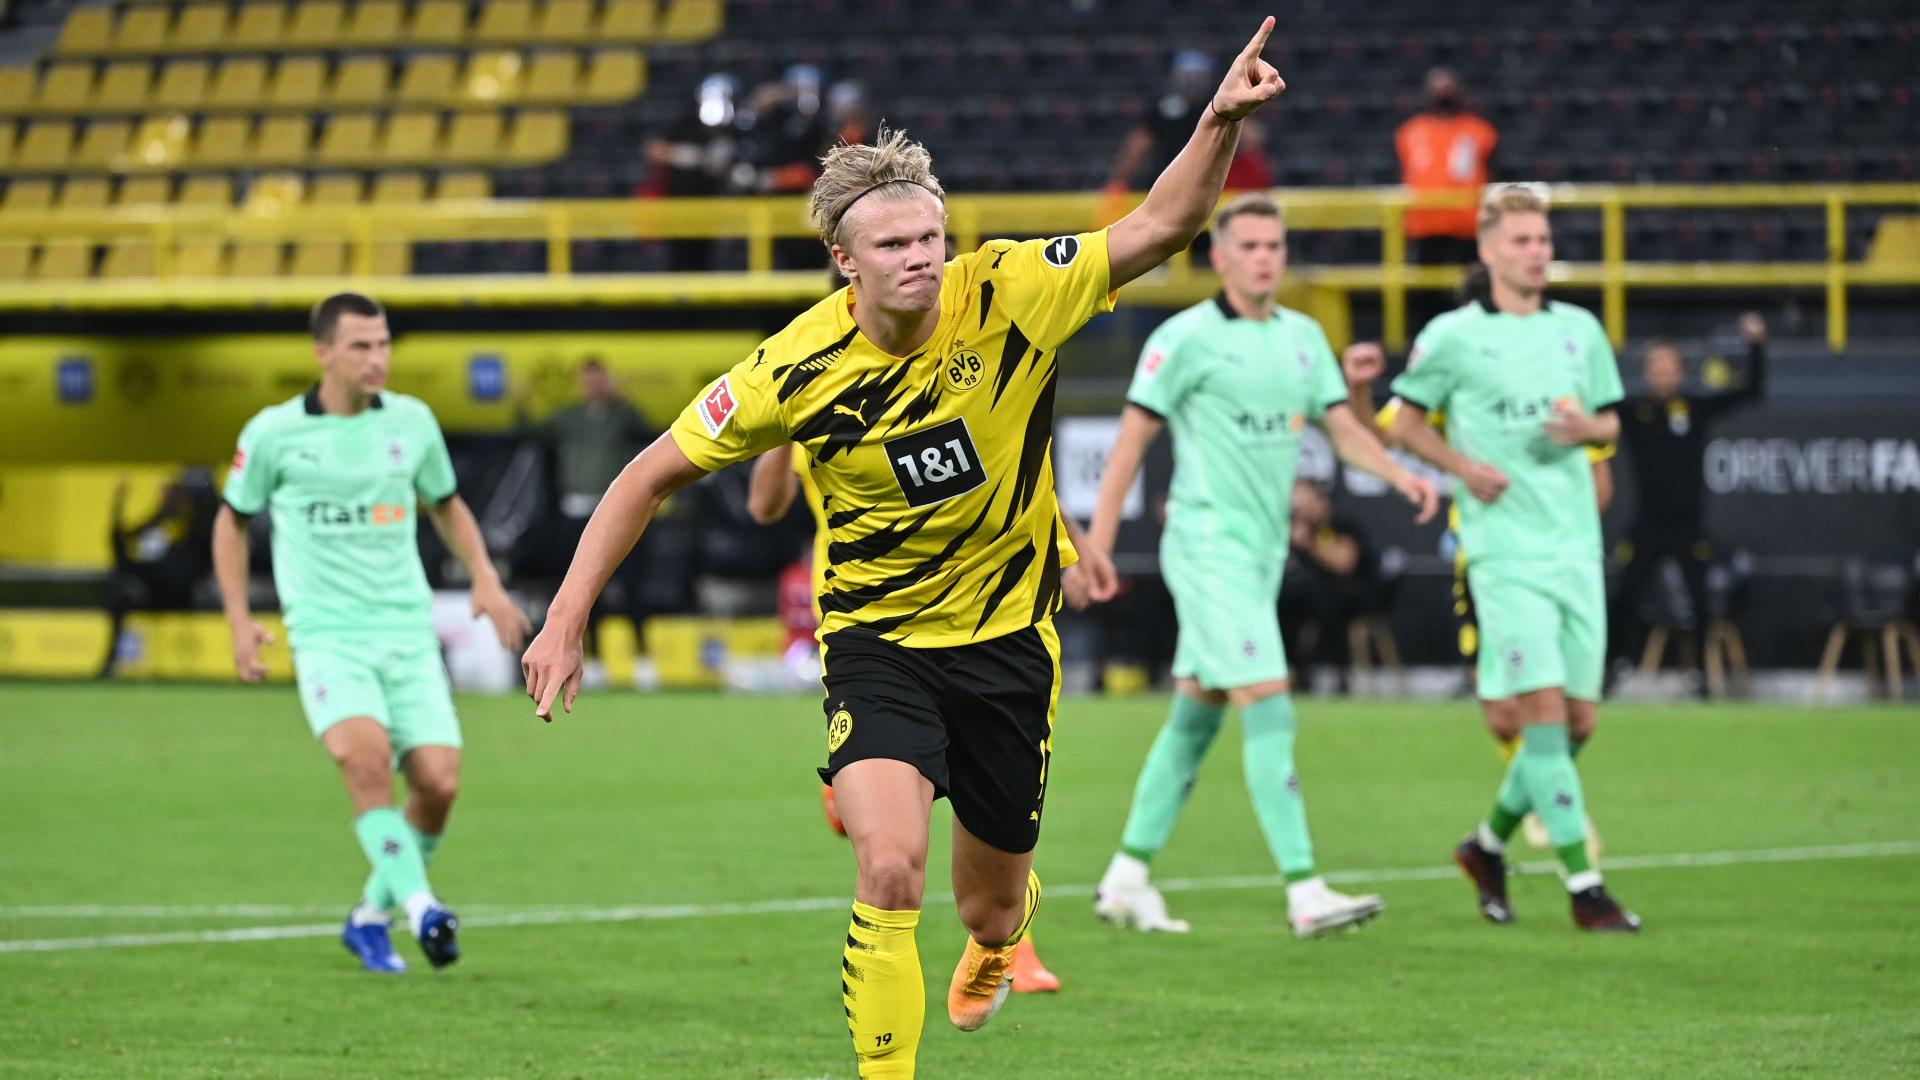 Borussia Dortmund - Borussia Monchengladbach (3-0), Haaland et le BvB répondent au Bayern Munich